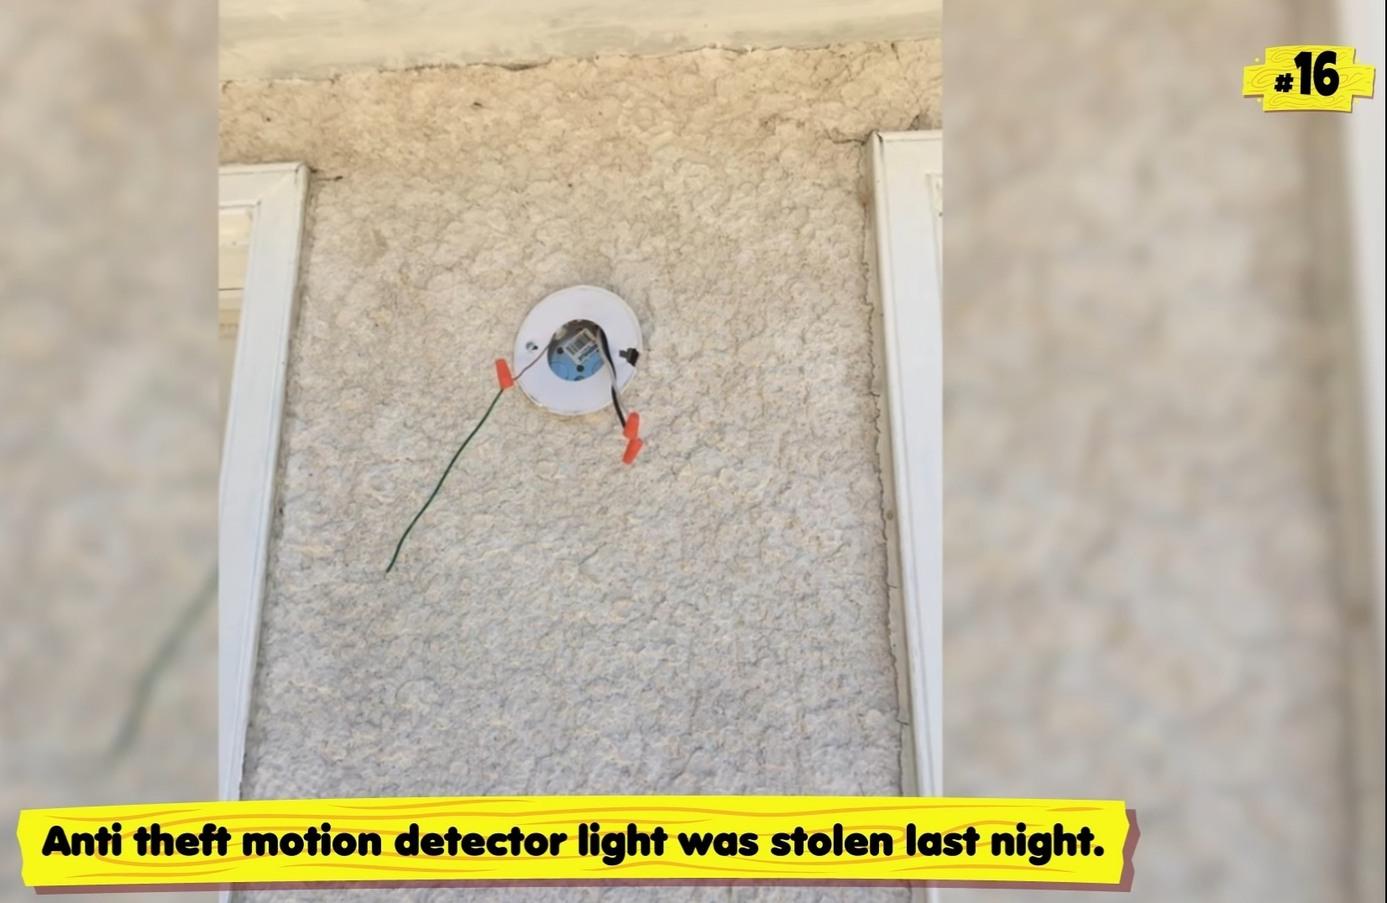 My anti theft motion detector were stolen last night - meme